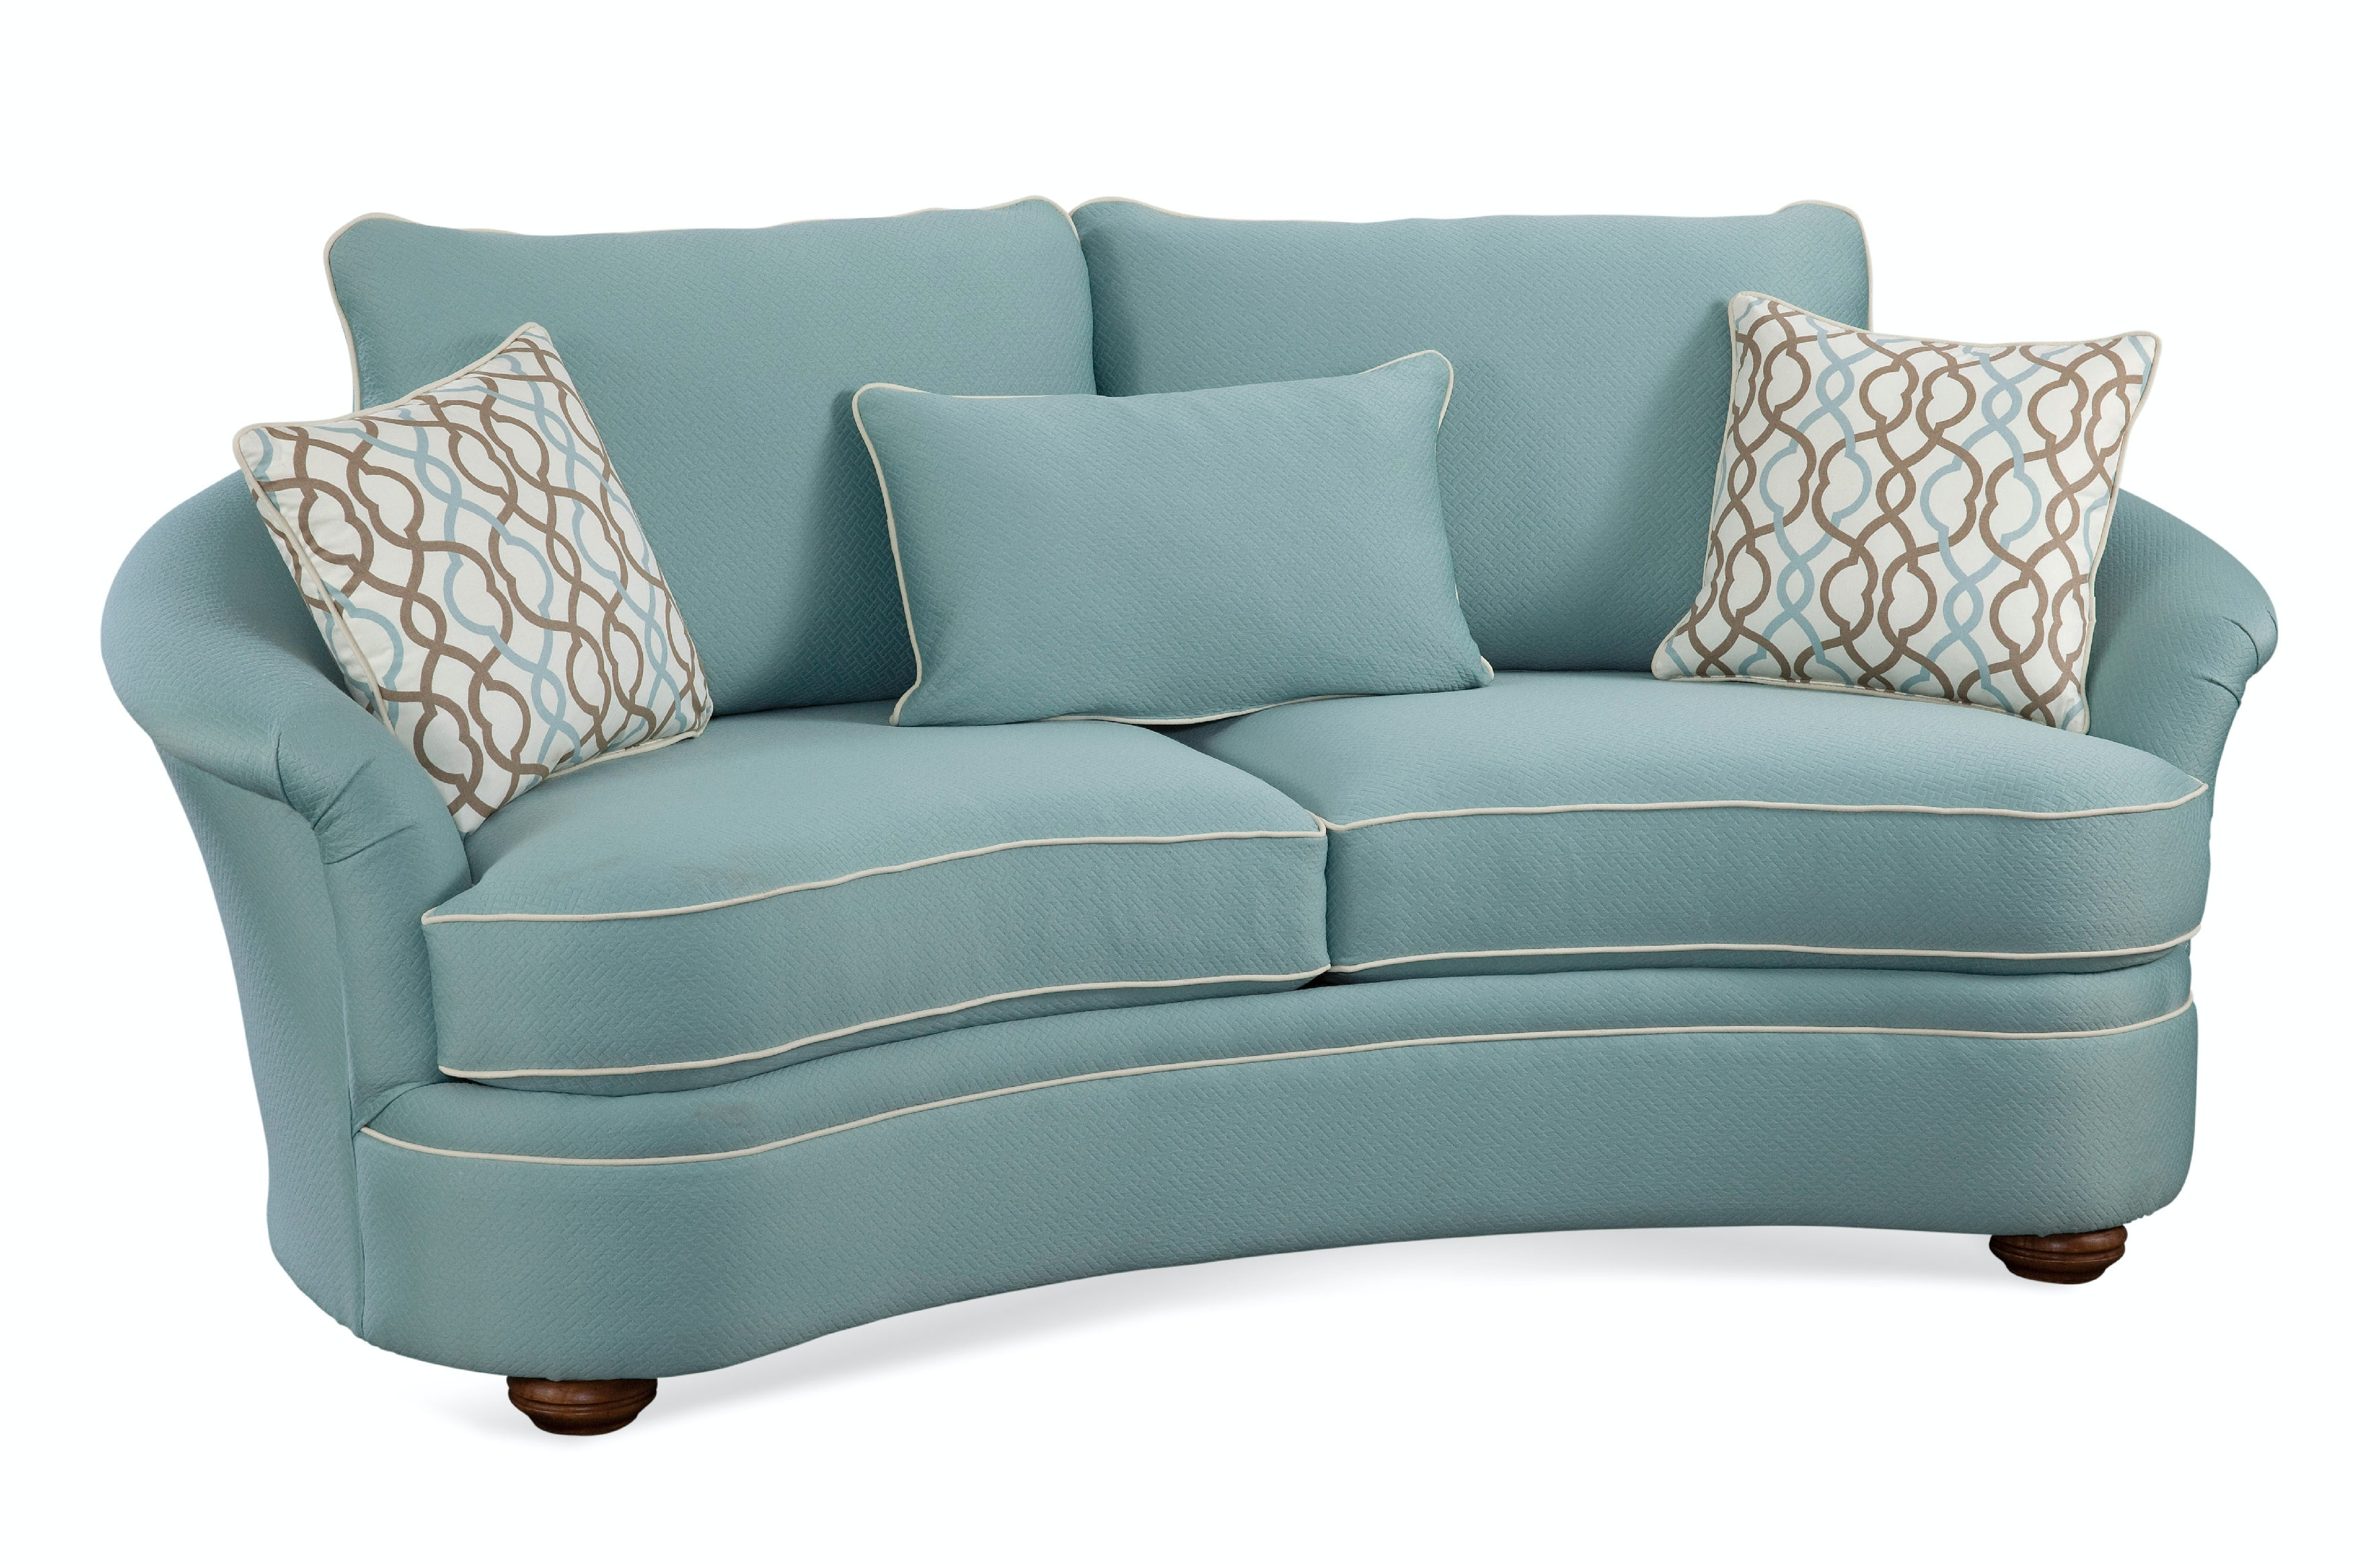 740 013. Conversation Sofa